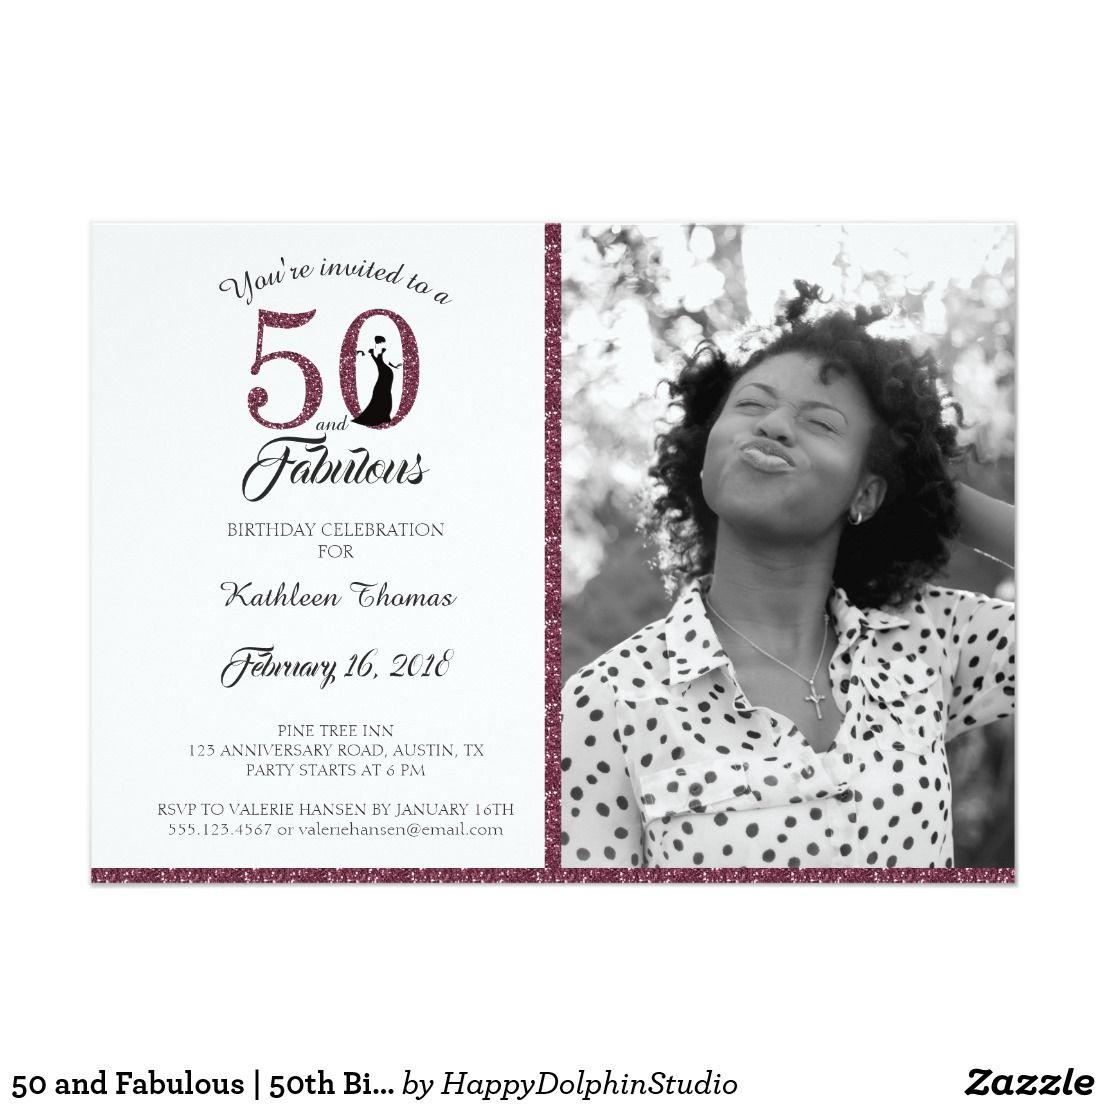 50 and Fabulous | 50th Birthday Party Invitation | 50th birthday ...